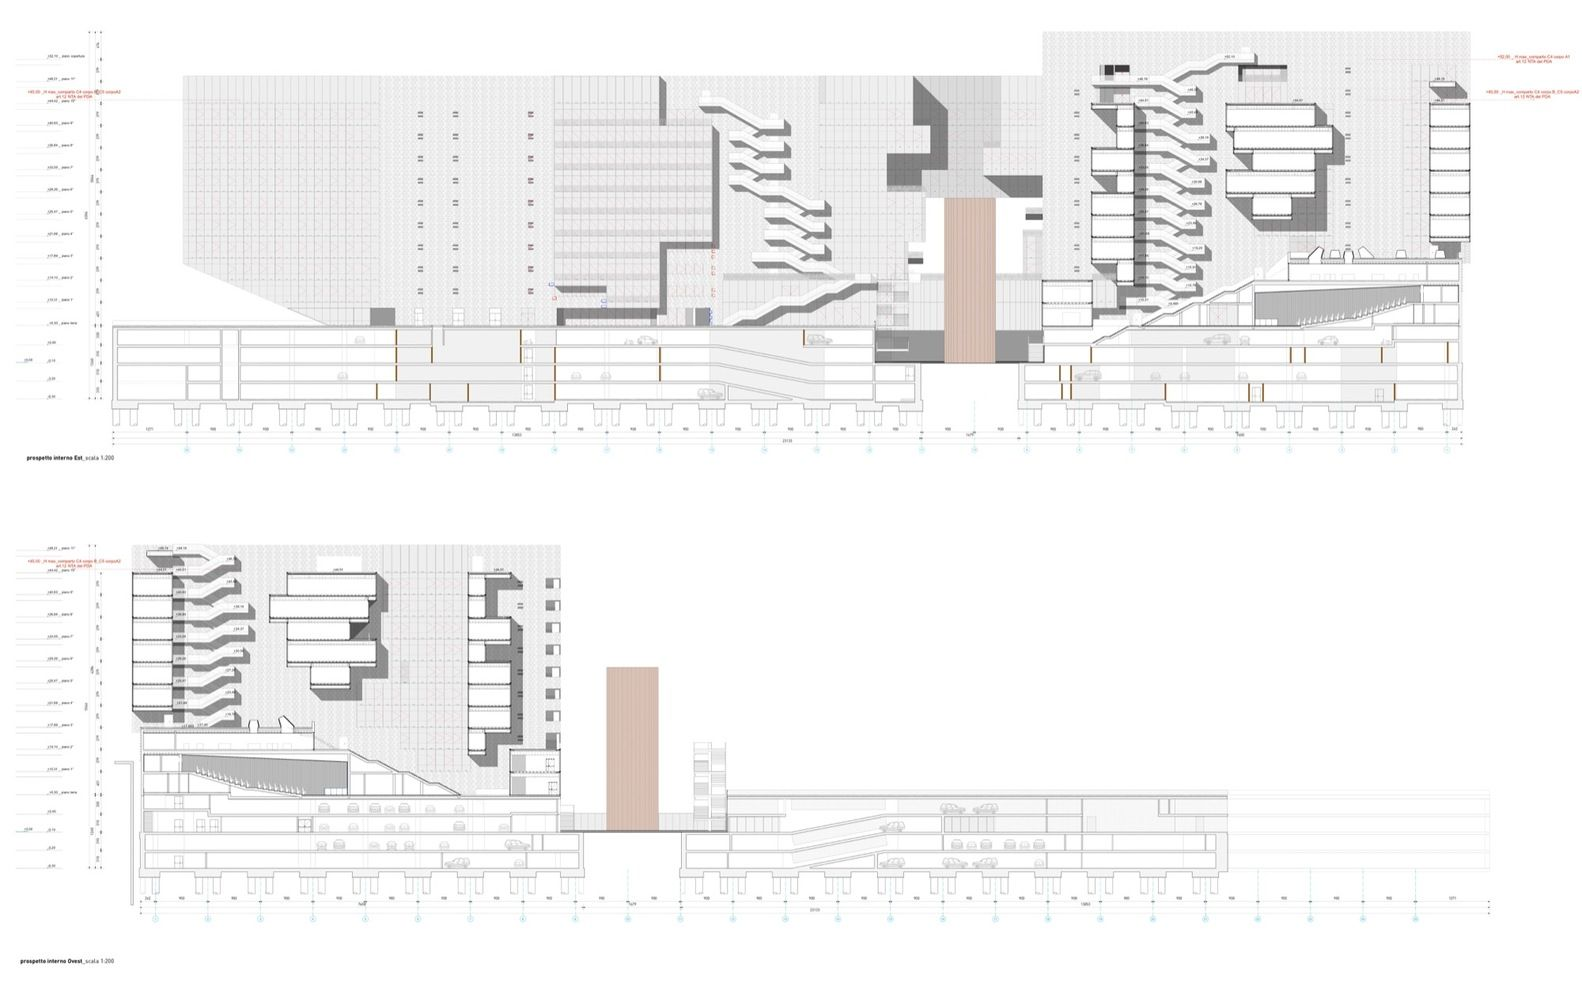 Gallery of BNL-BNP Paribas Headquarters / 5+1AA Alfonso Femia Gianluca Peluffo - 22